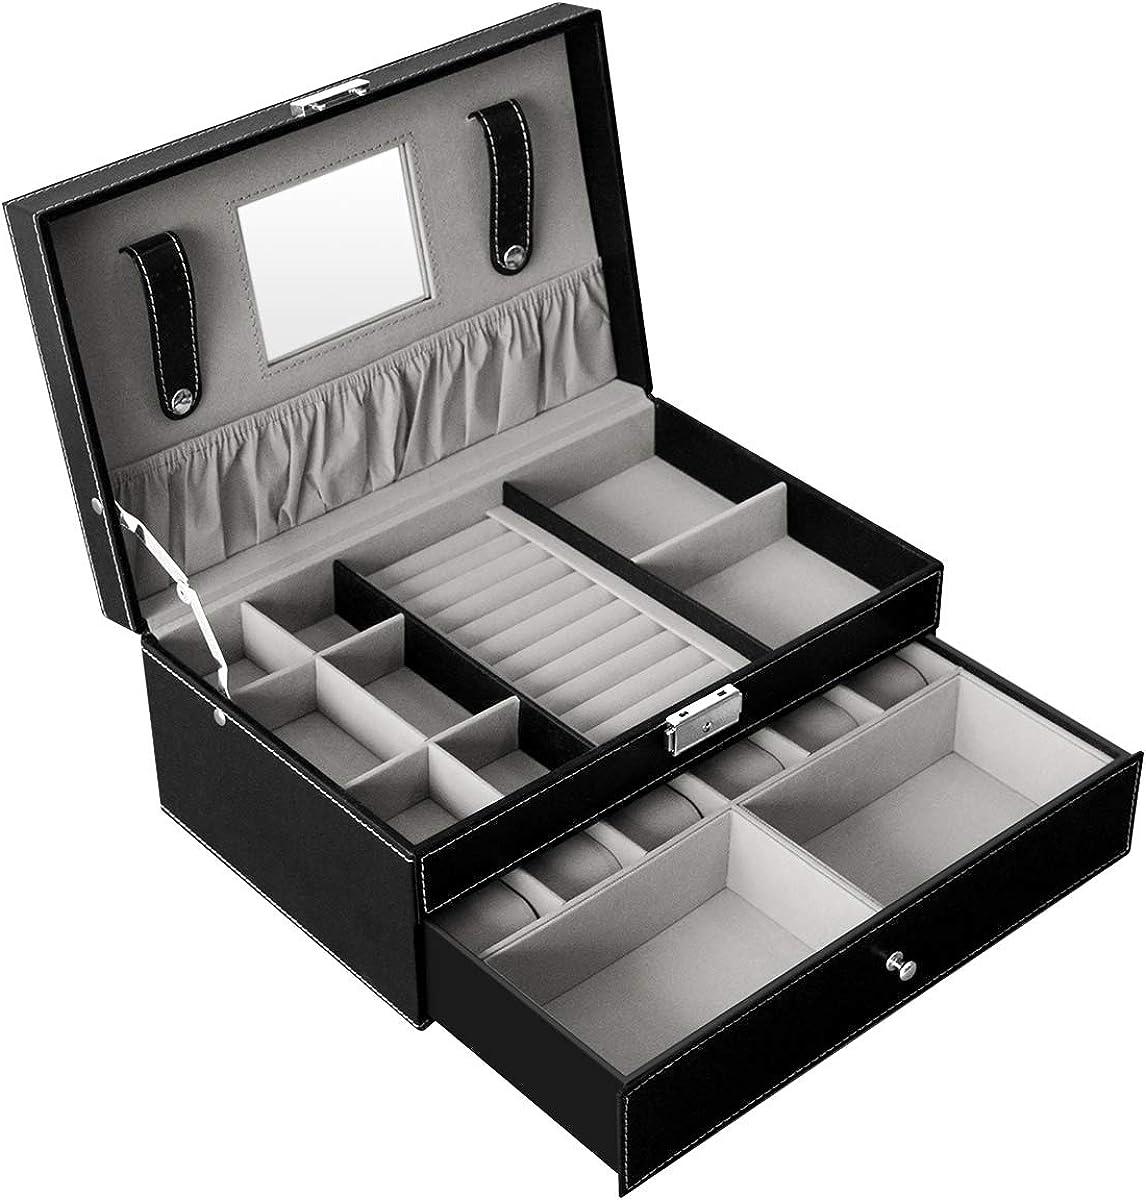 DoubleBlack Caja Joyero Organizador Bandeja para Joyas Bisuteria Relojes Armario